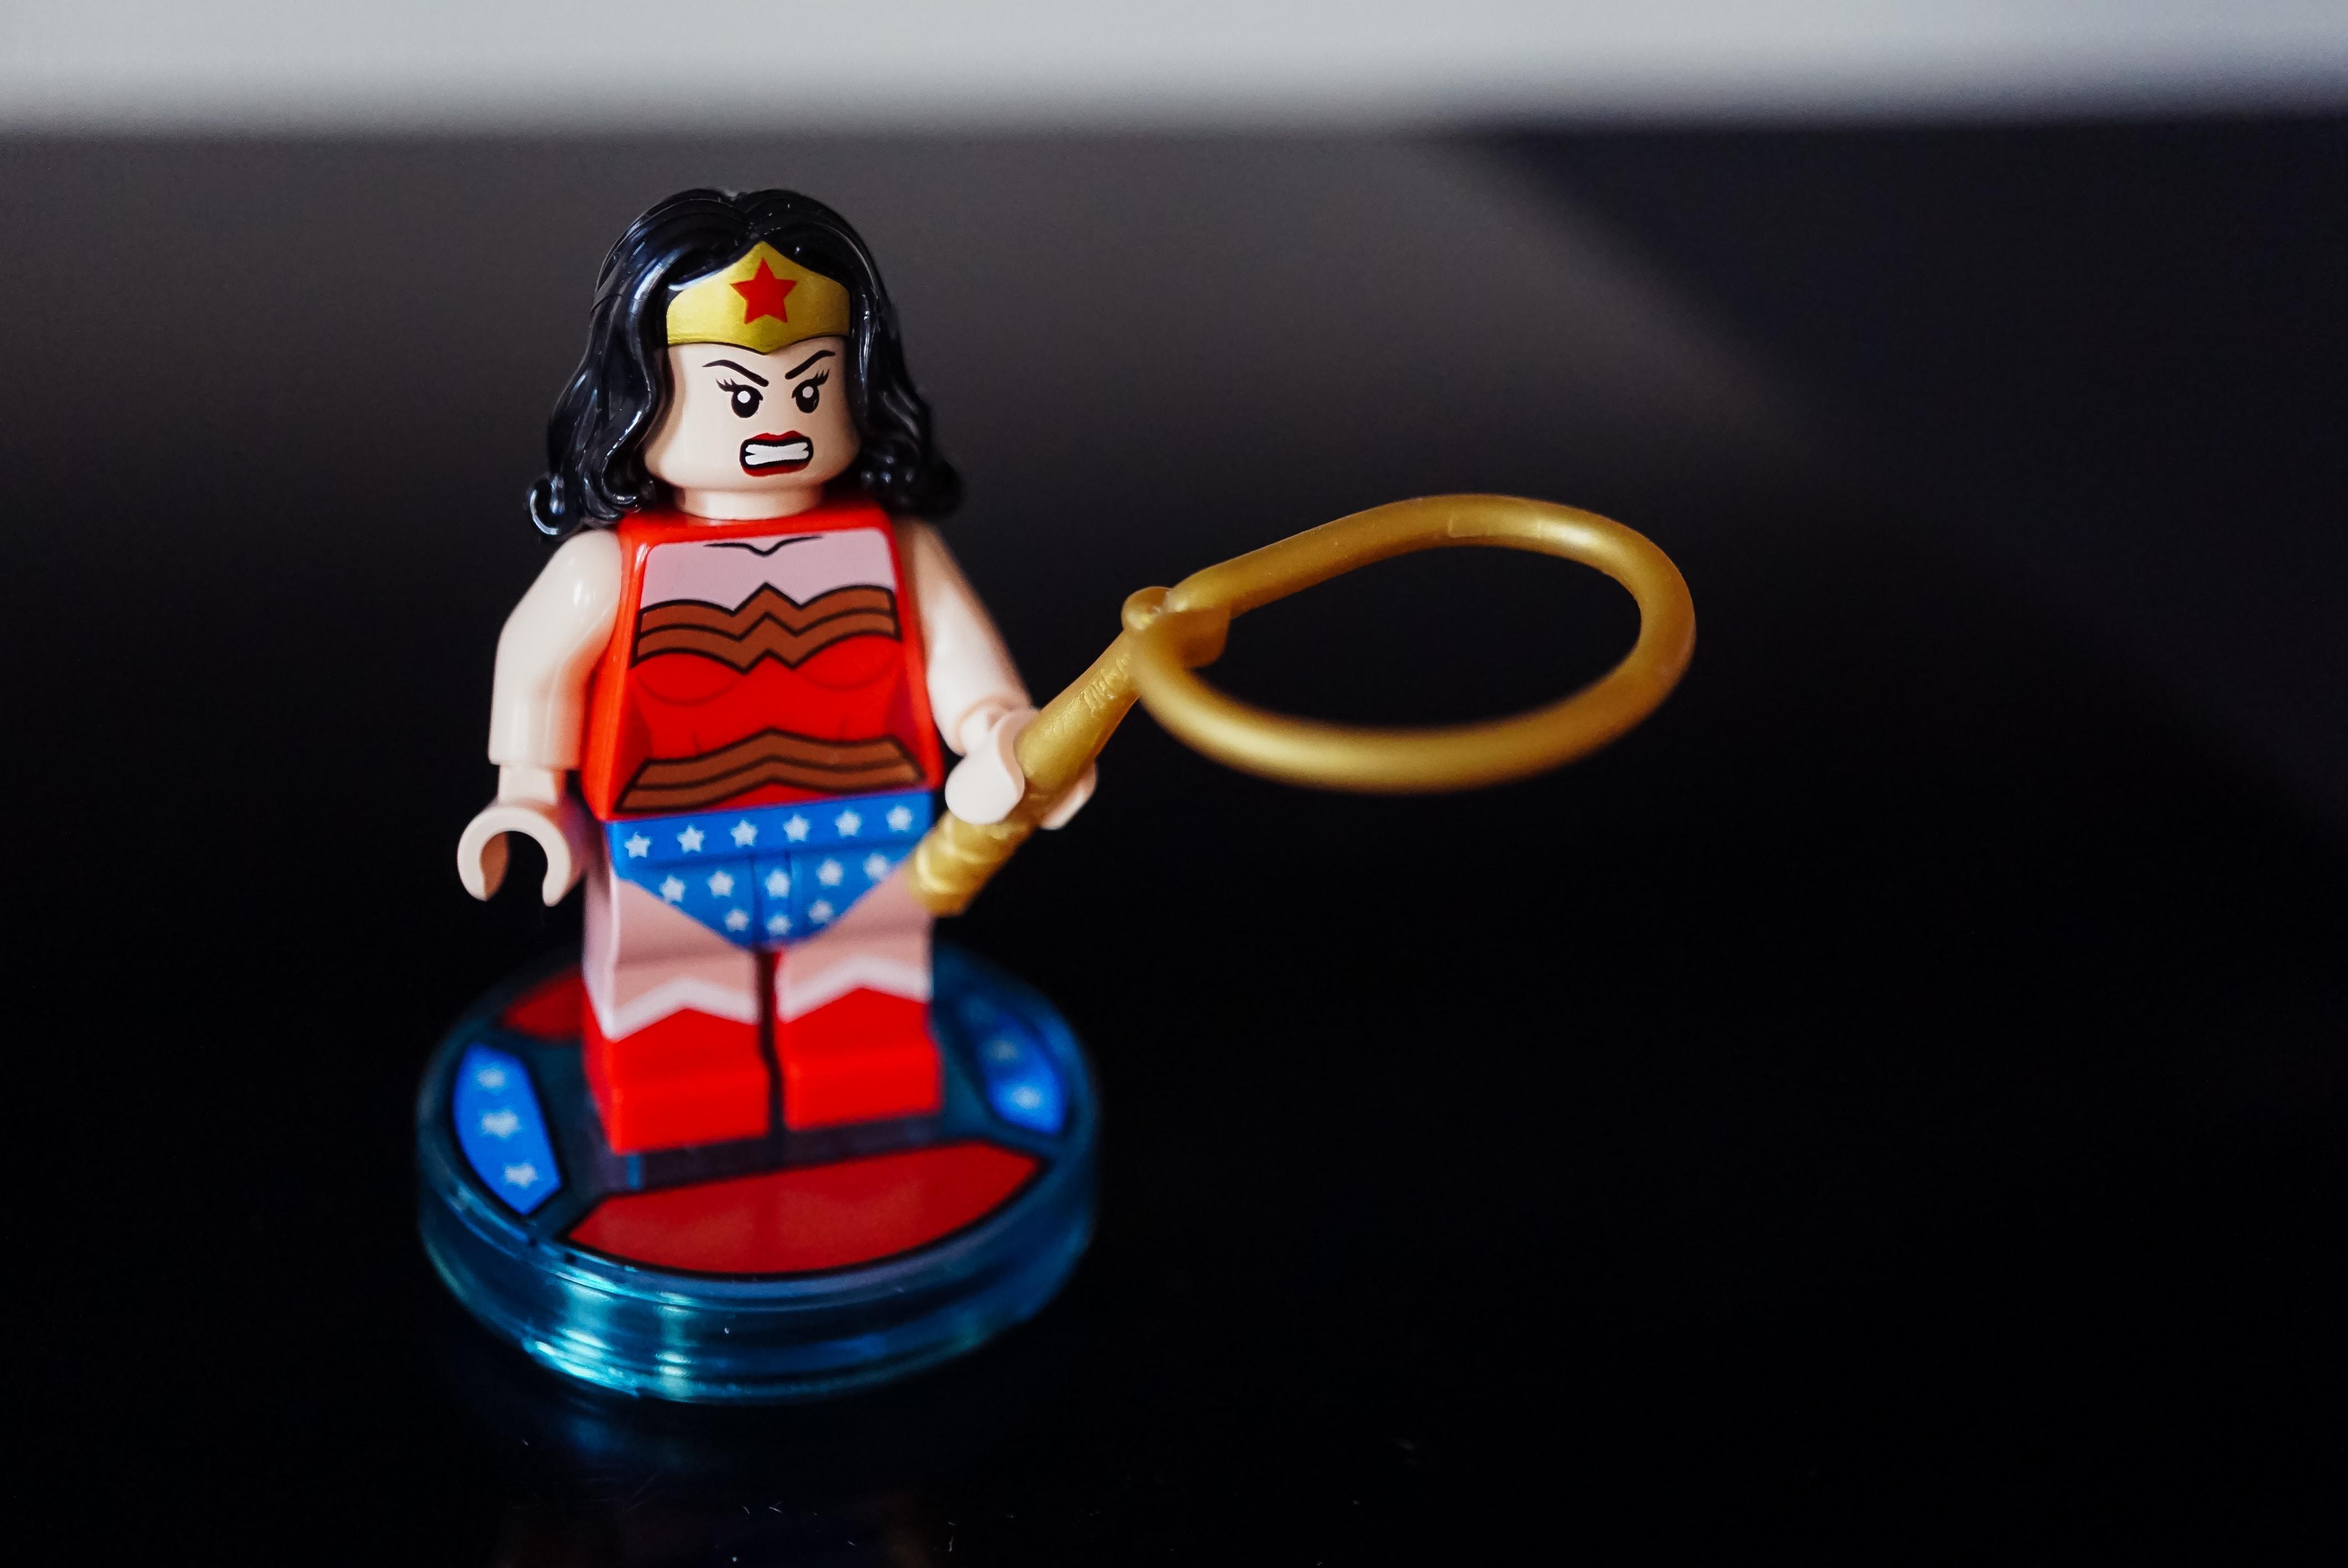 Wonder Woman Lego holding whip toy